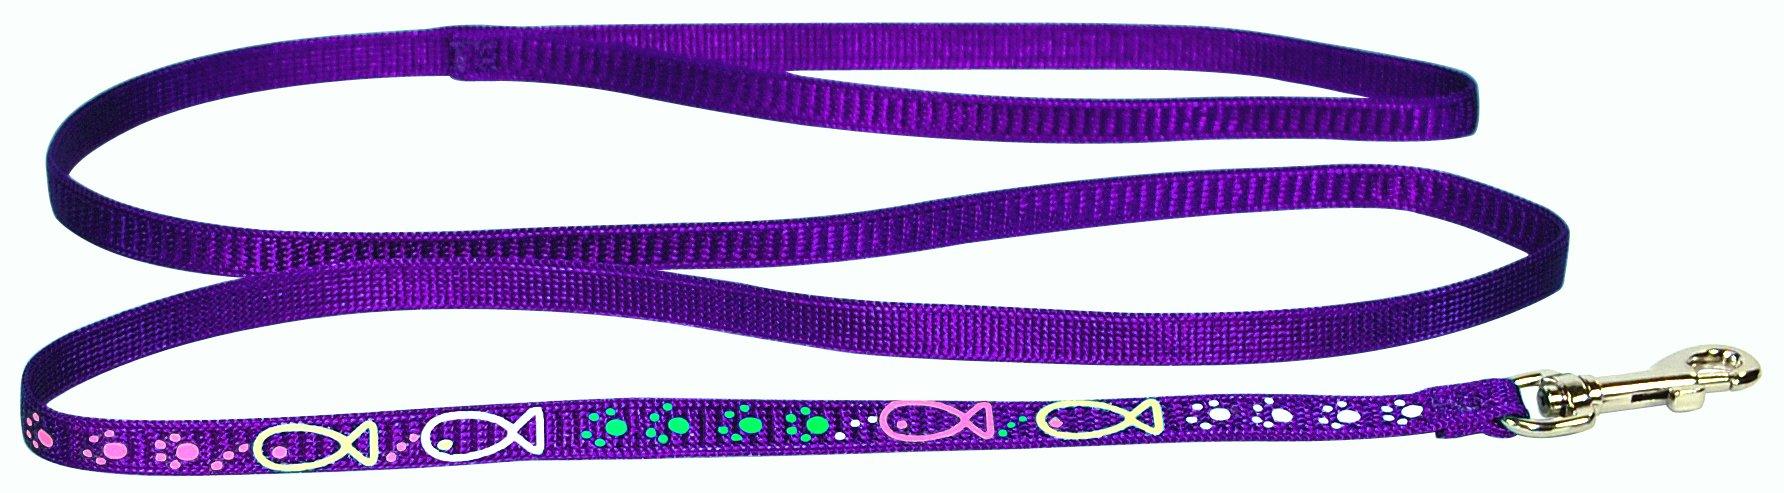 Hamilton Cat Lead with Cat Fish Paw Design, 3/8-Inch by 4-Feet, Purple Nylon